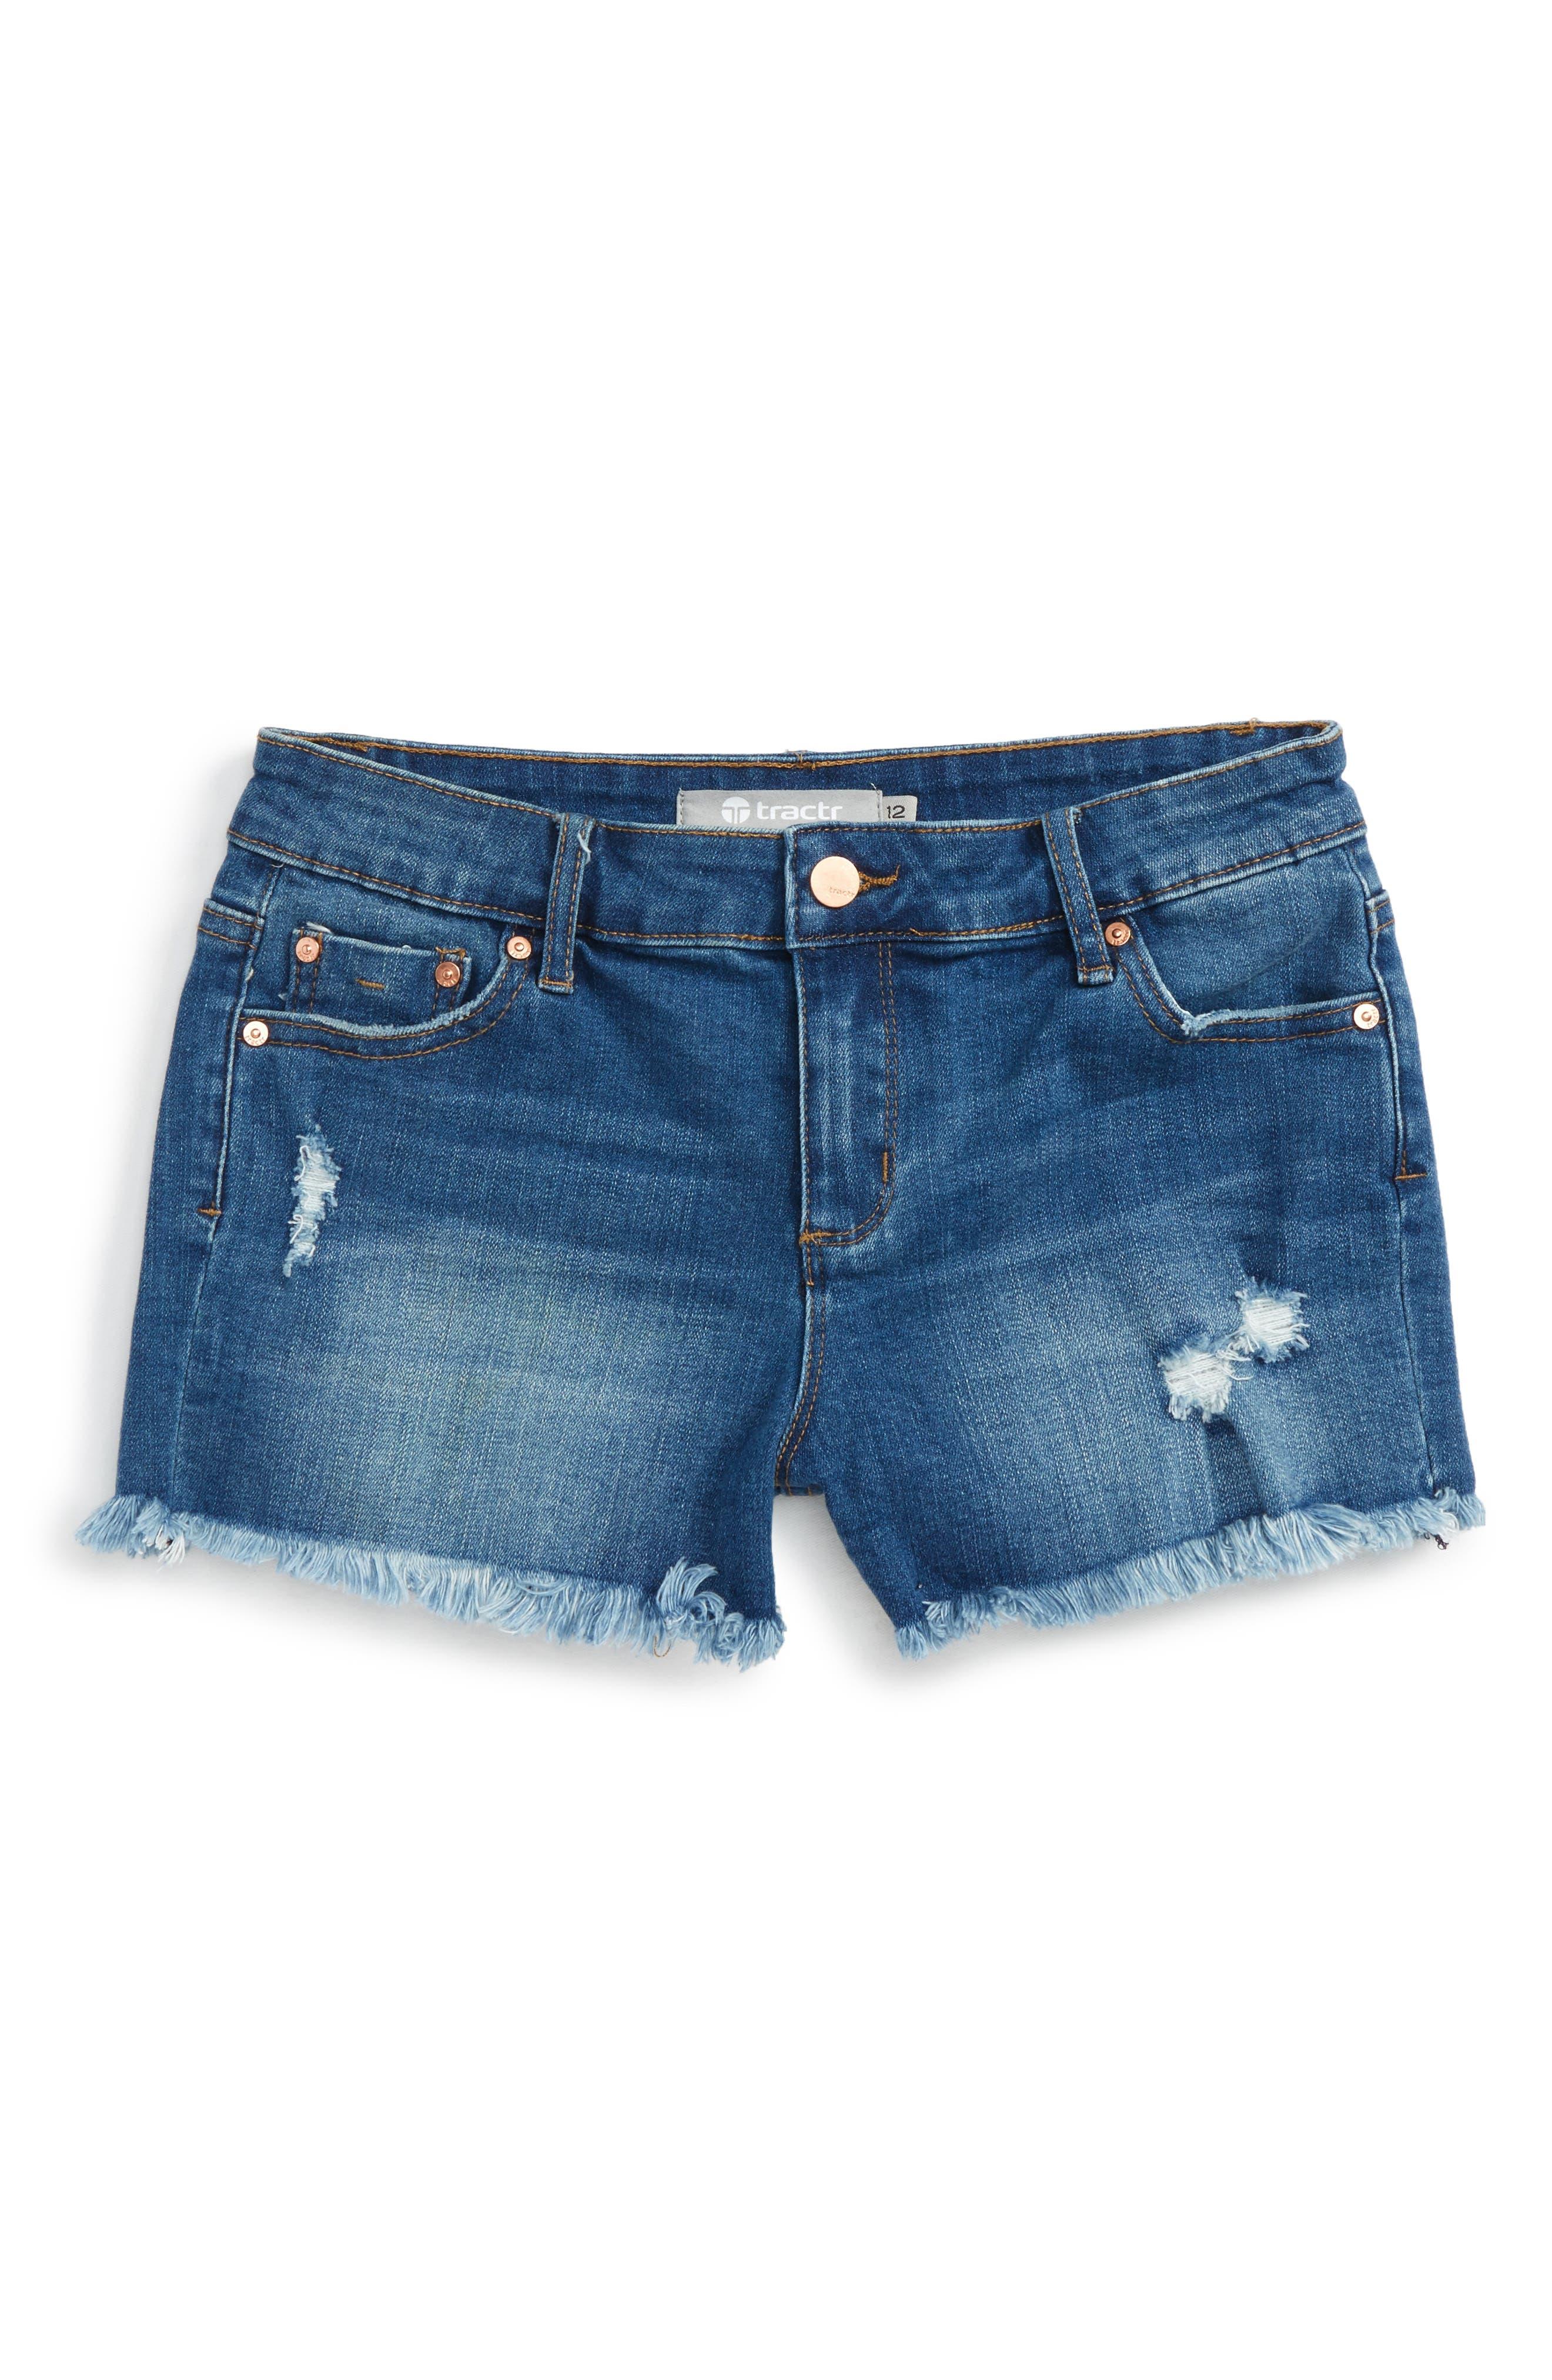 Main Image - Tractr Distressed Cutoff Denim Shorts (Big Girls)